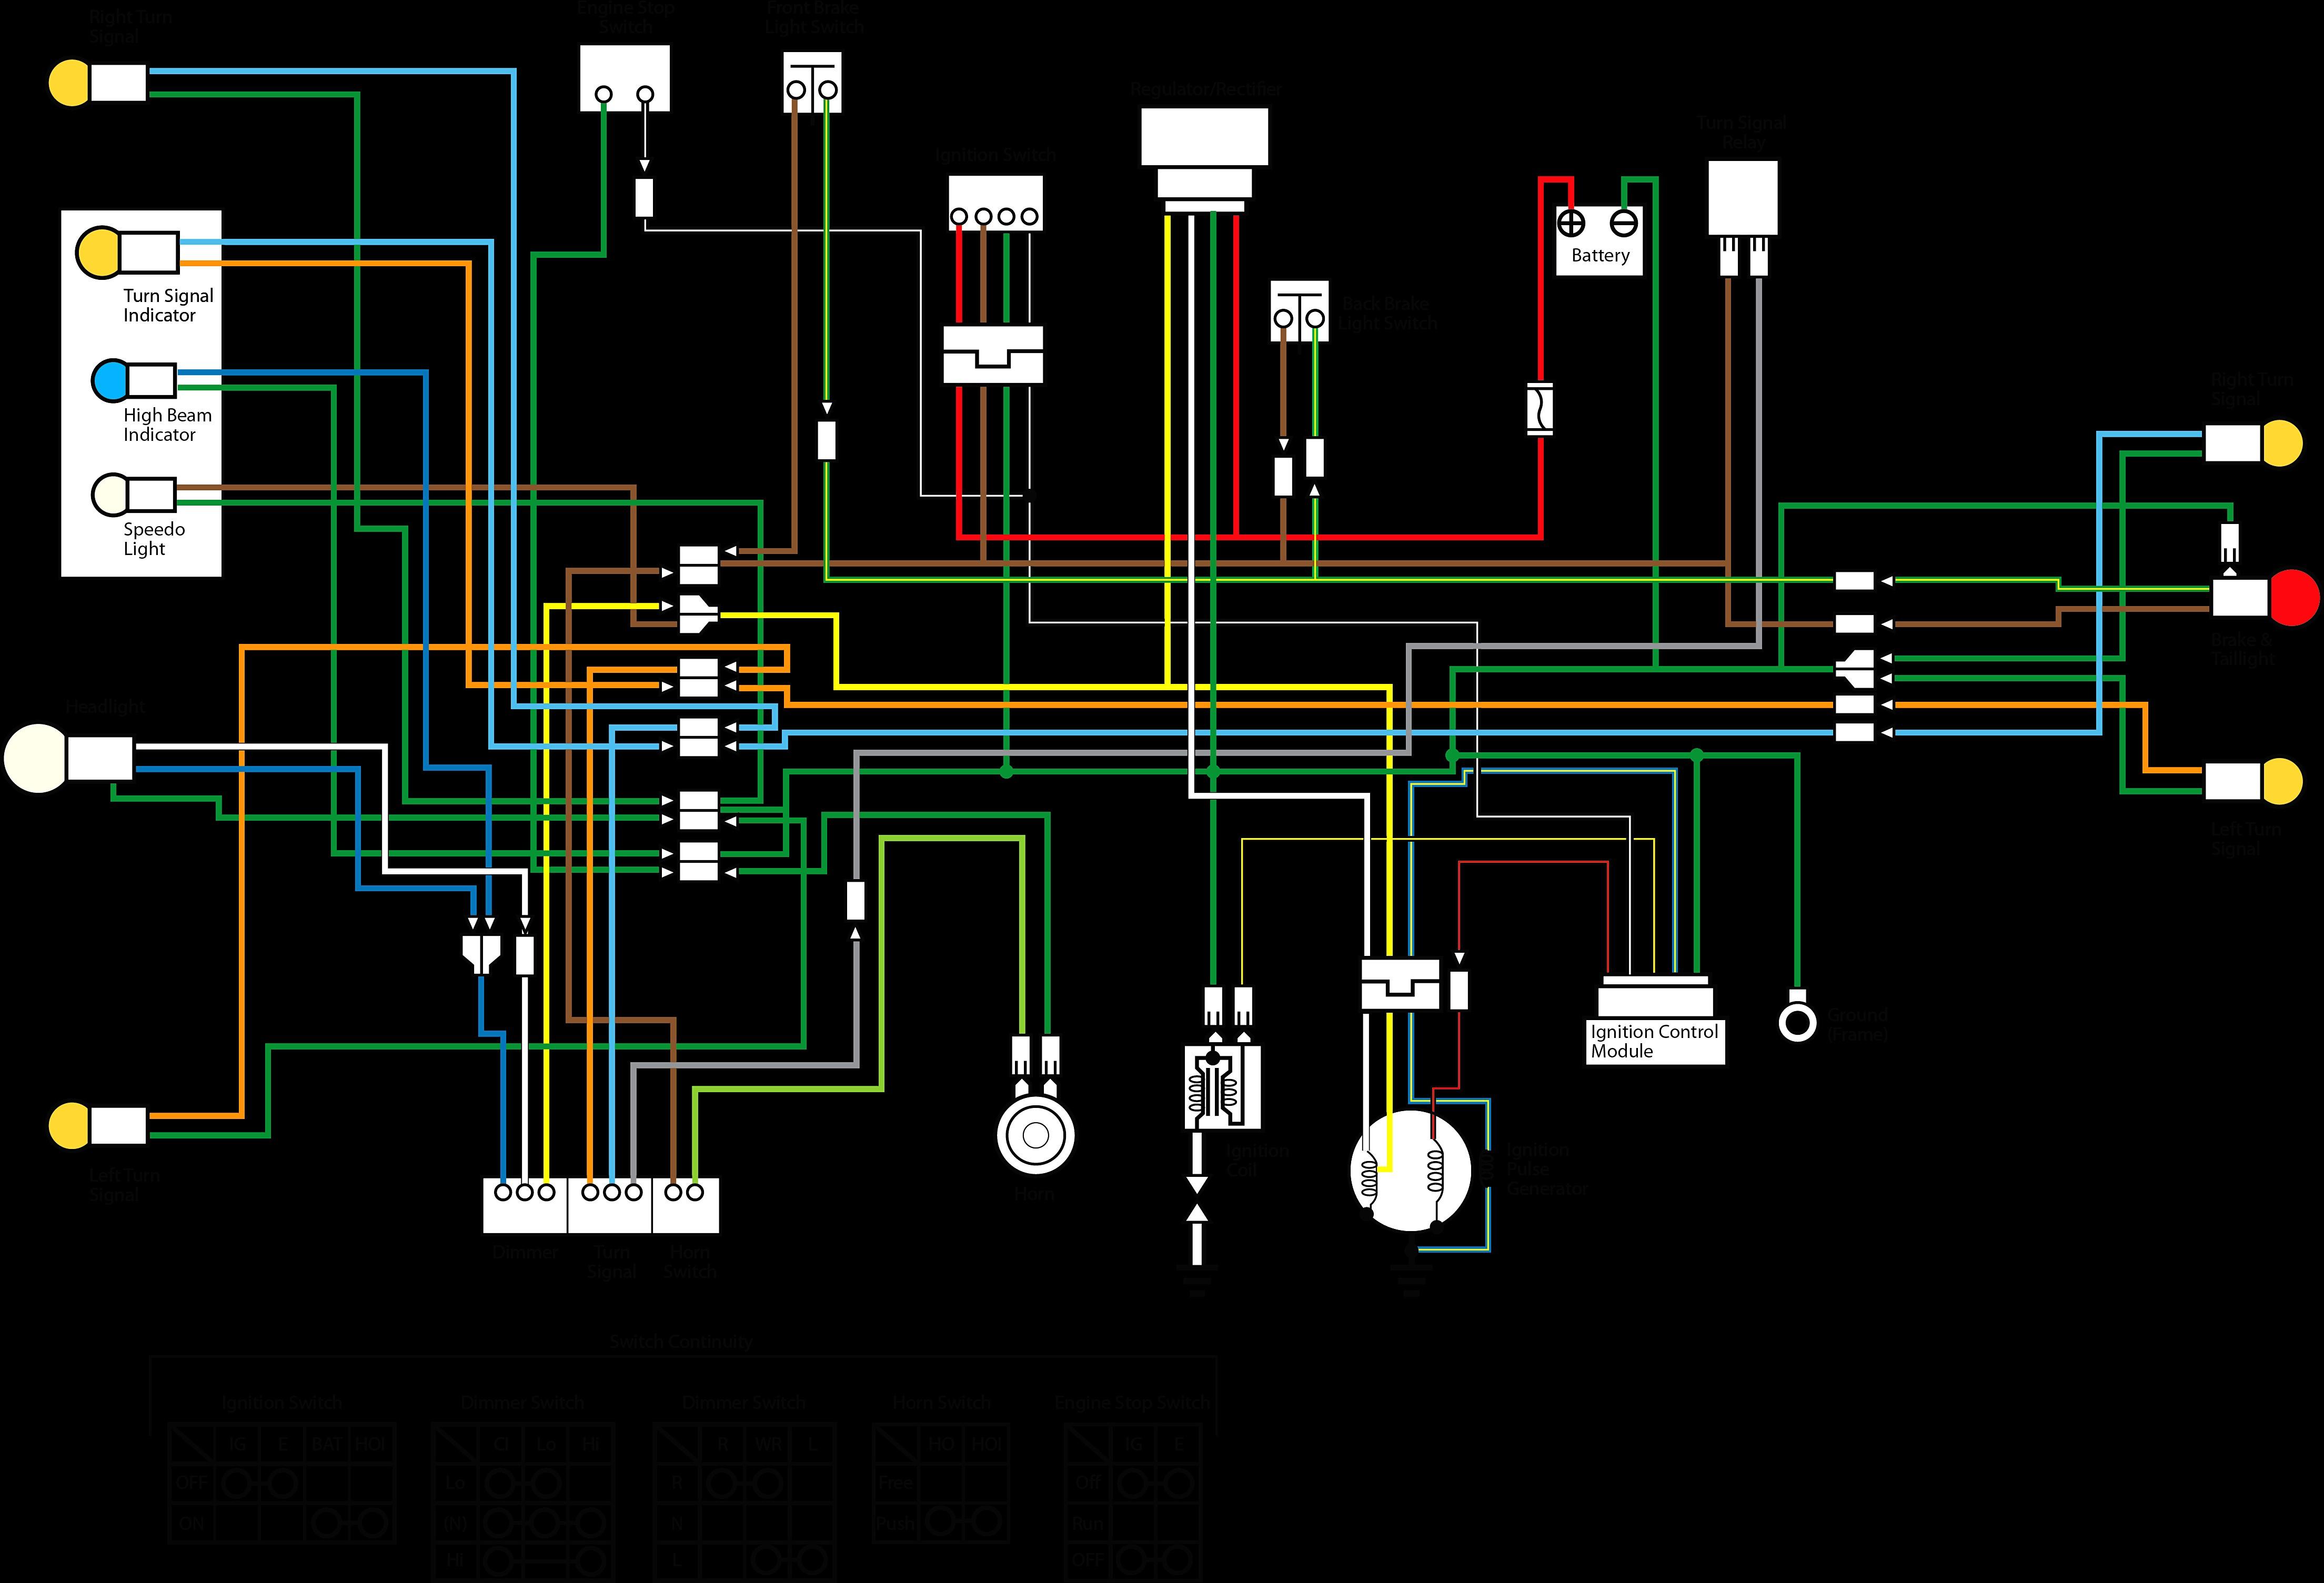 Honda Xr 125 Wiring Diagram Irelandnews Best Wiring Diagrams Of Honda Xr 125 Wiring Diagram